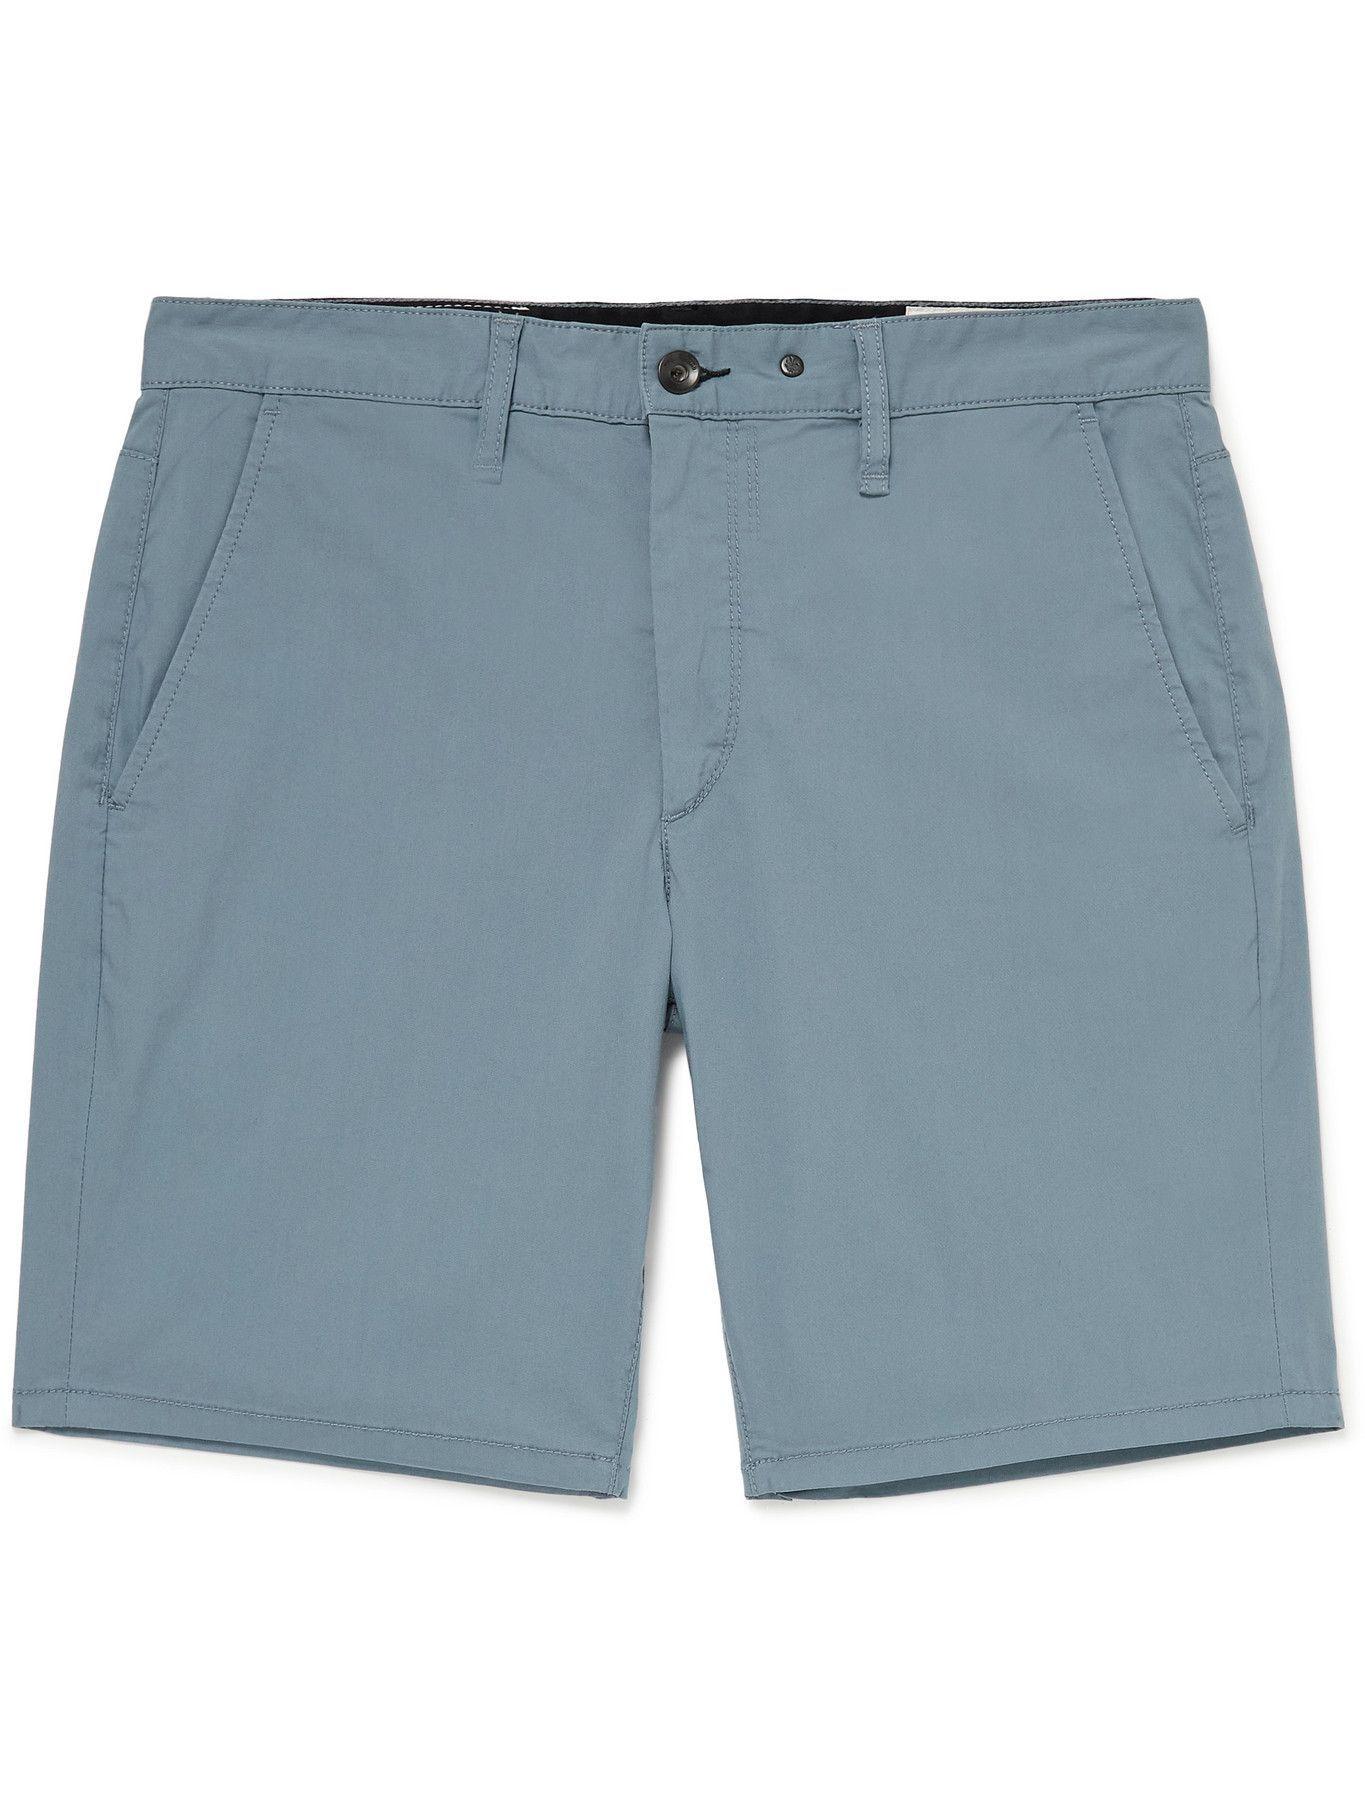 Photo: RAG & BONE - Paperweight Cotton-Blend Chino Shorts - Blue